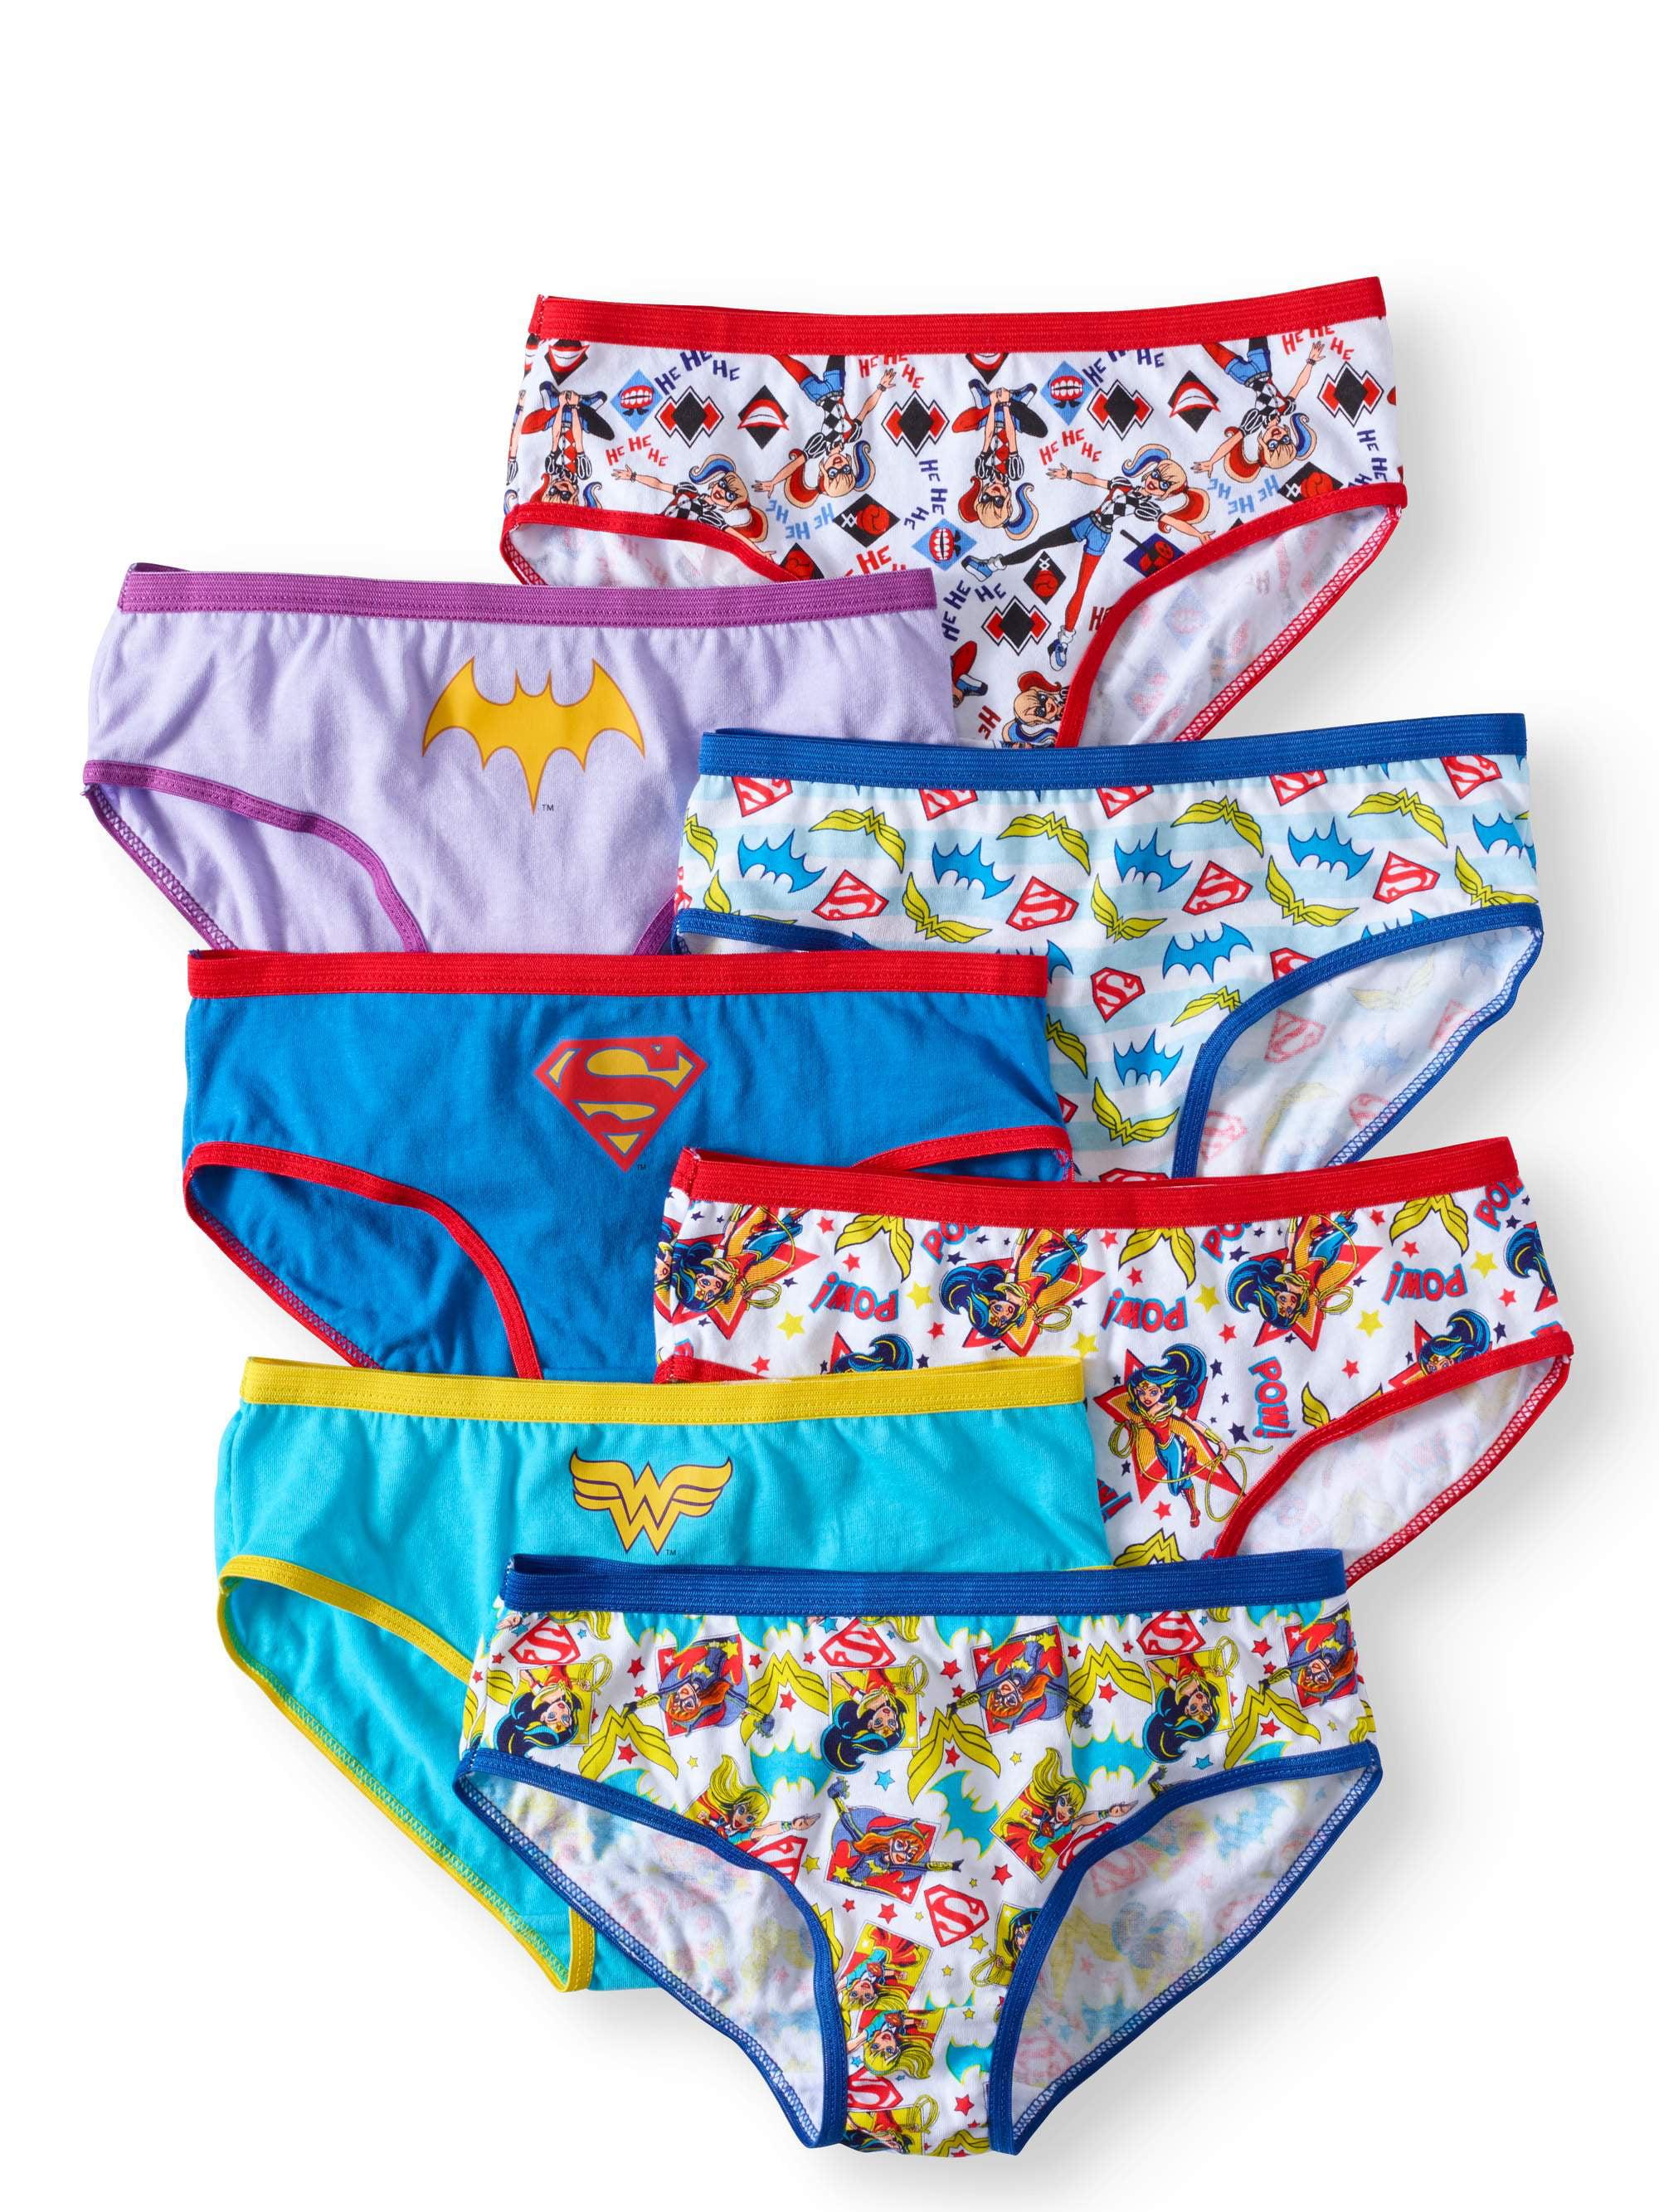 DC Super Hero Girls Girls' Hipster, 7-Pack